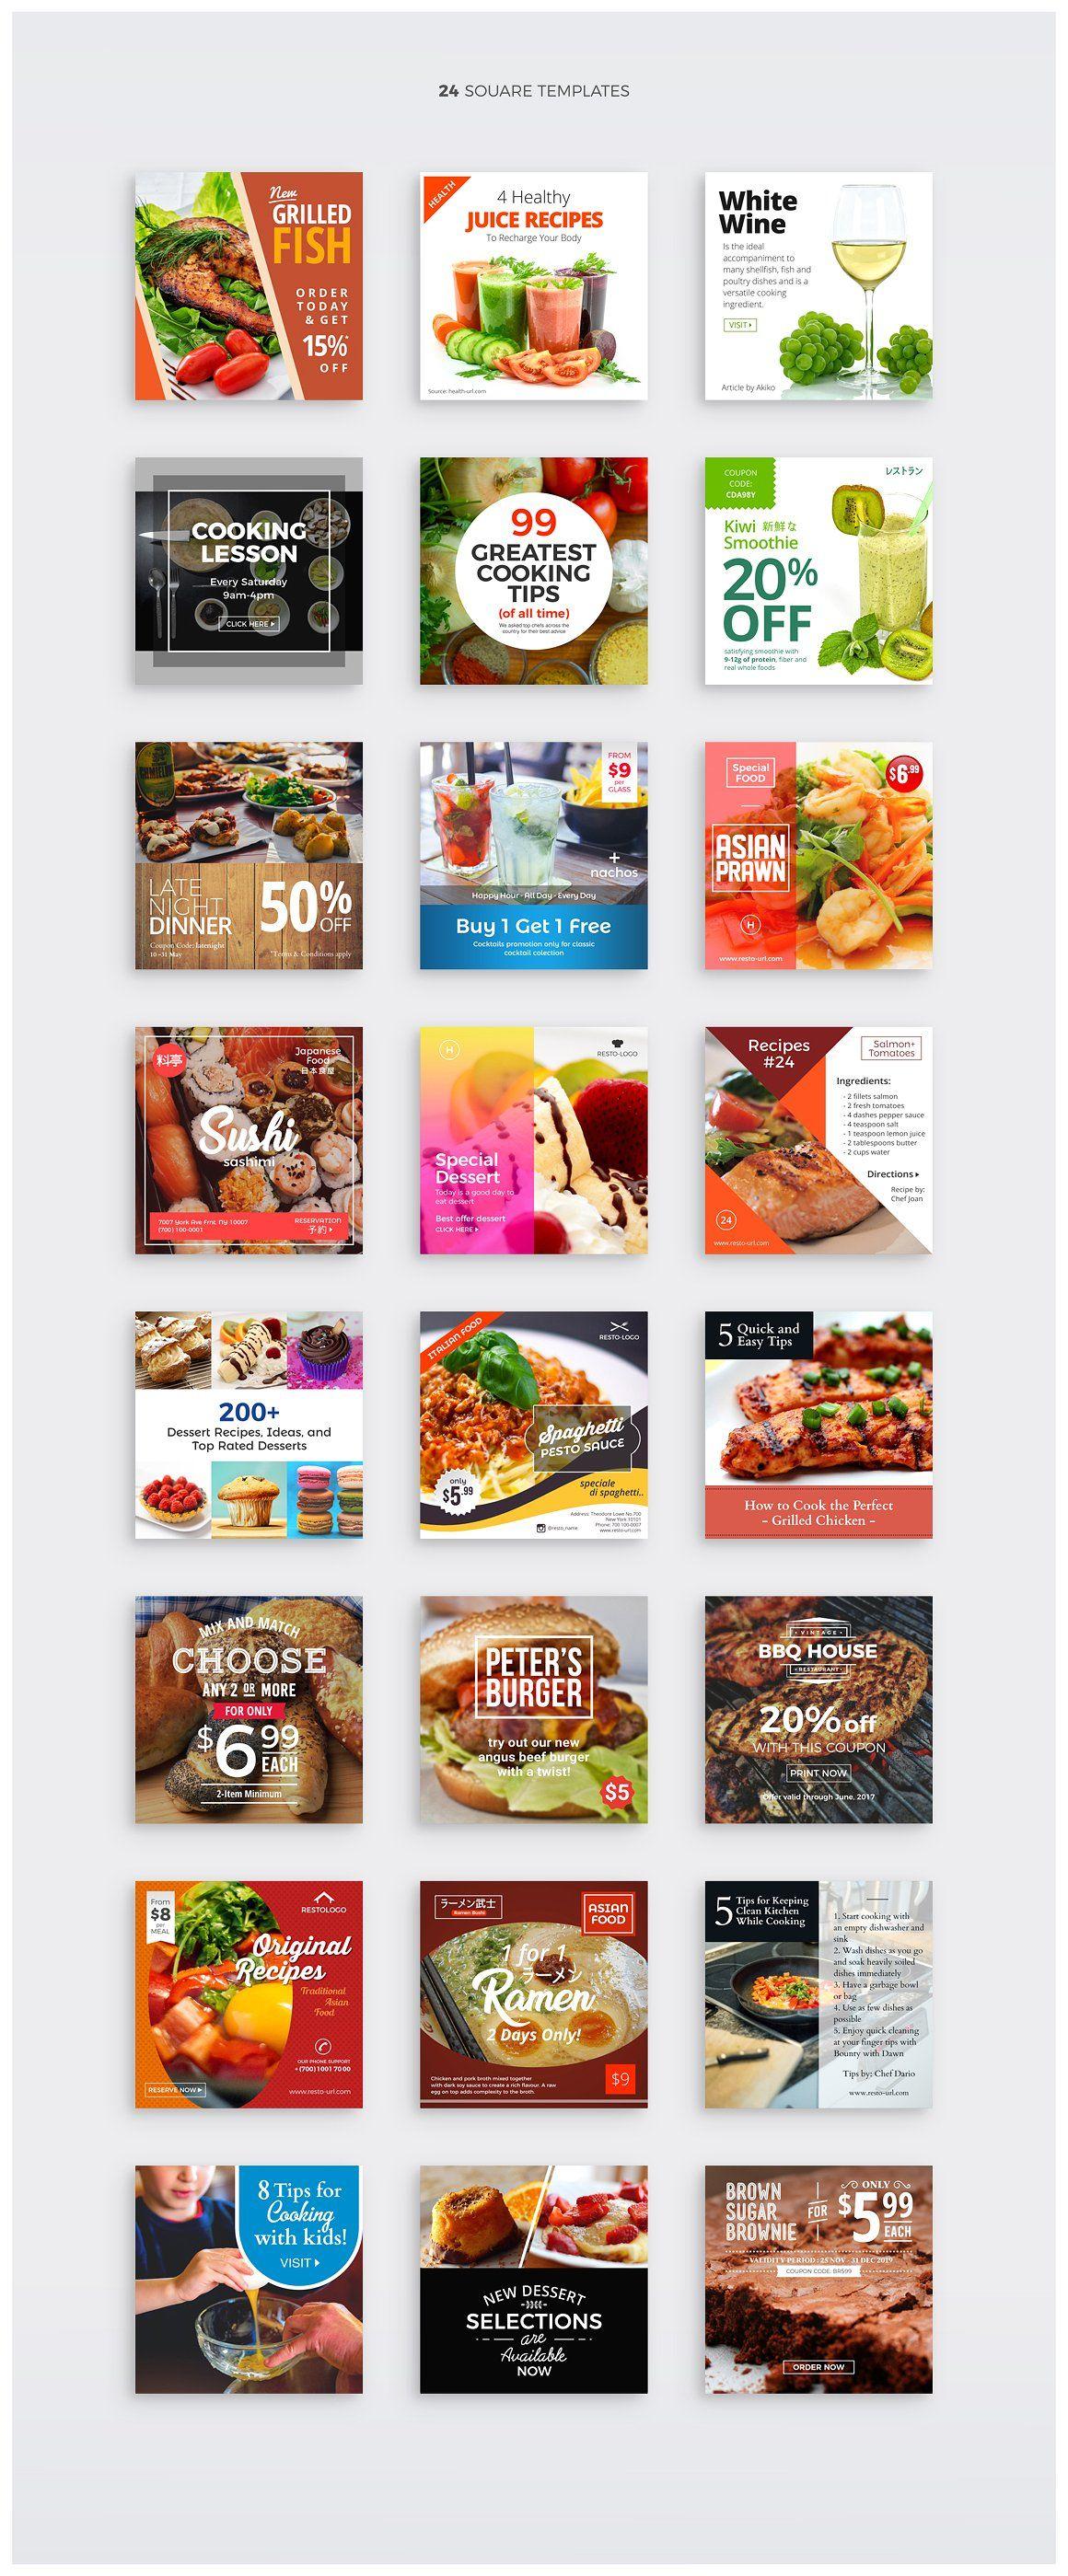 Template Banner Makanan - desain spanduk keren